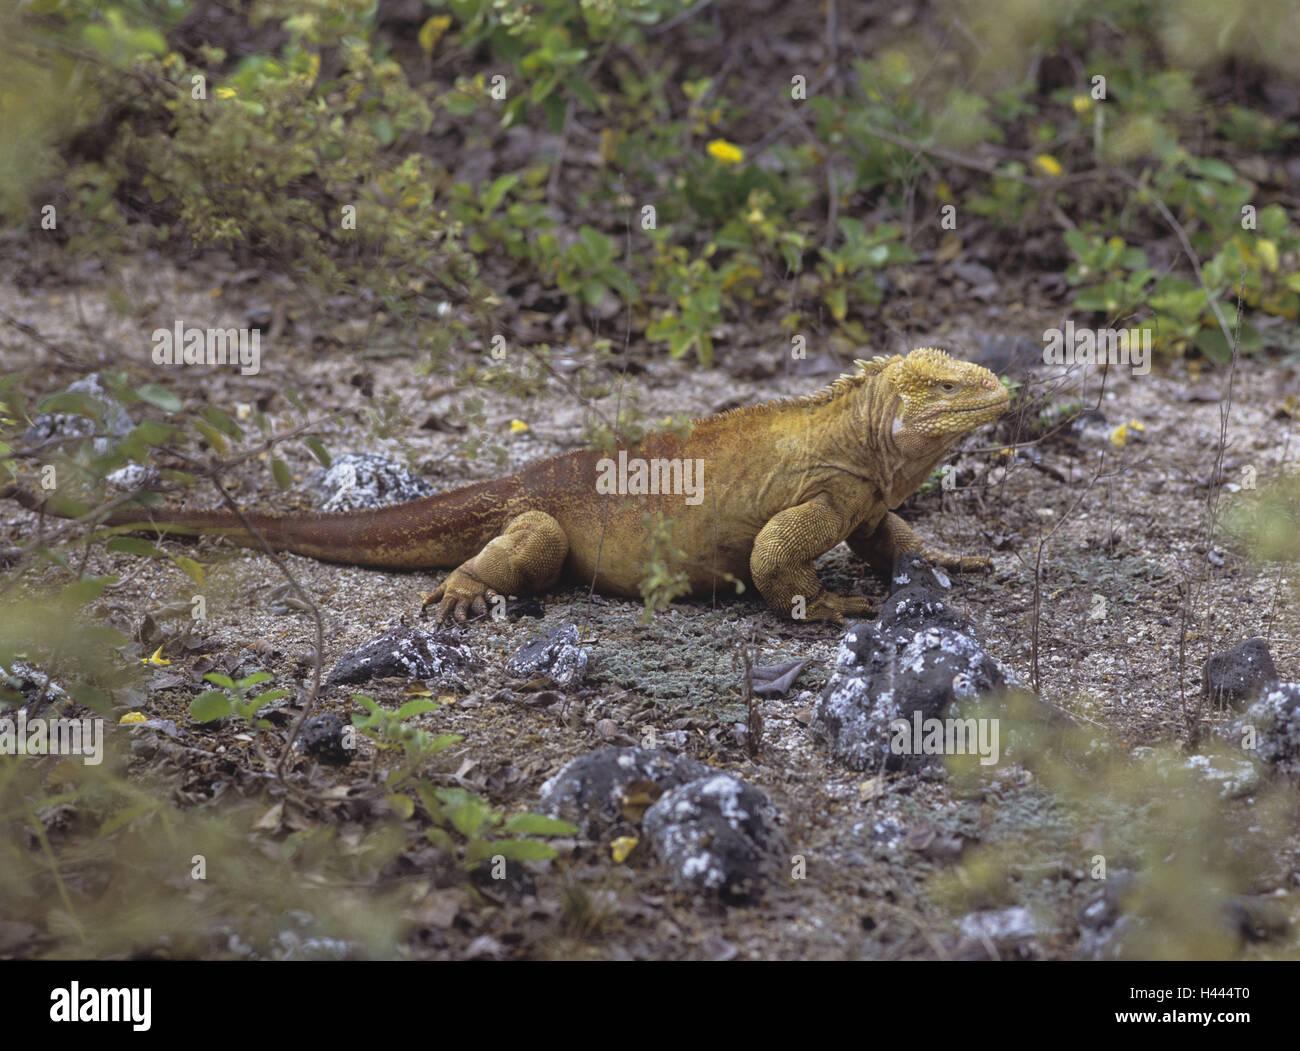 The Galapagos Islands, island Darwin, bile coast, druse head, Conolophus, subcristatus, the Pacific, island group, - Stock Image